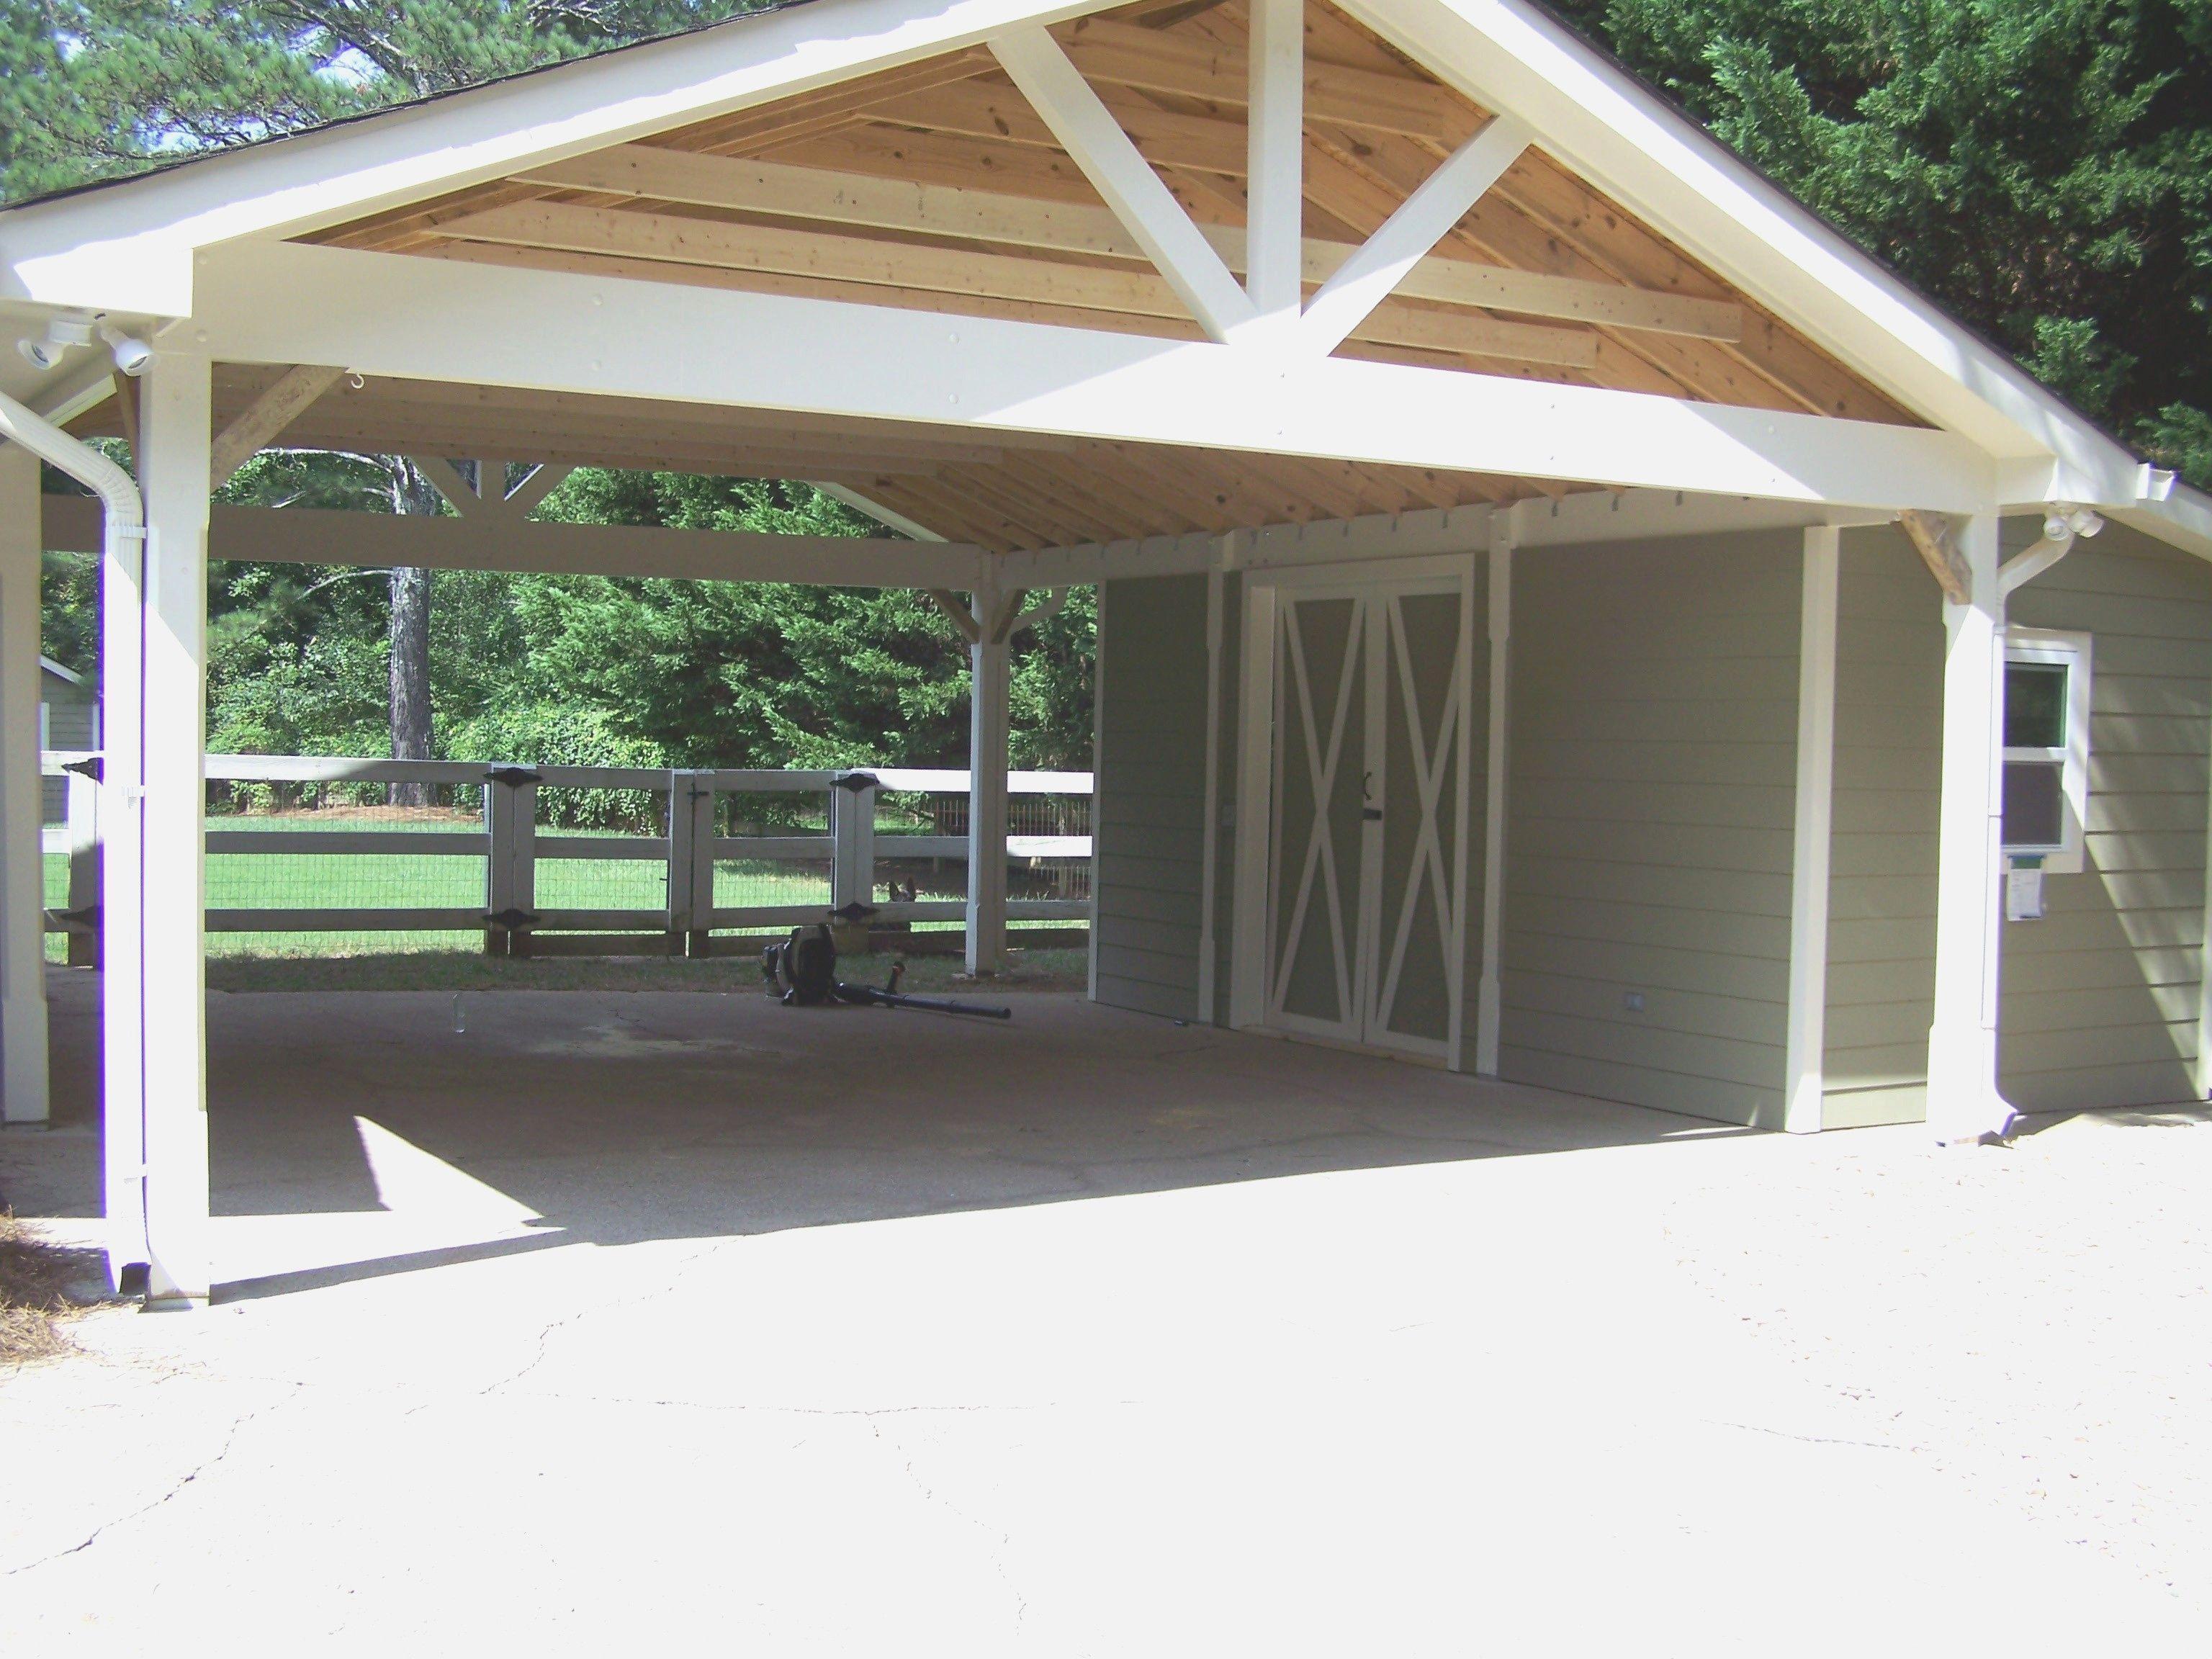 Carport Ideas Alphatravelvn Com Building A Carport Pergola House Front